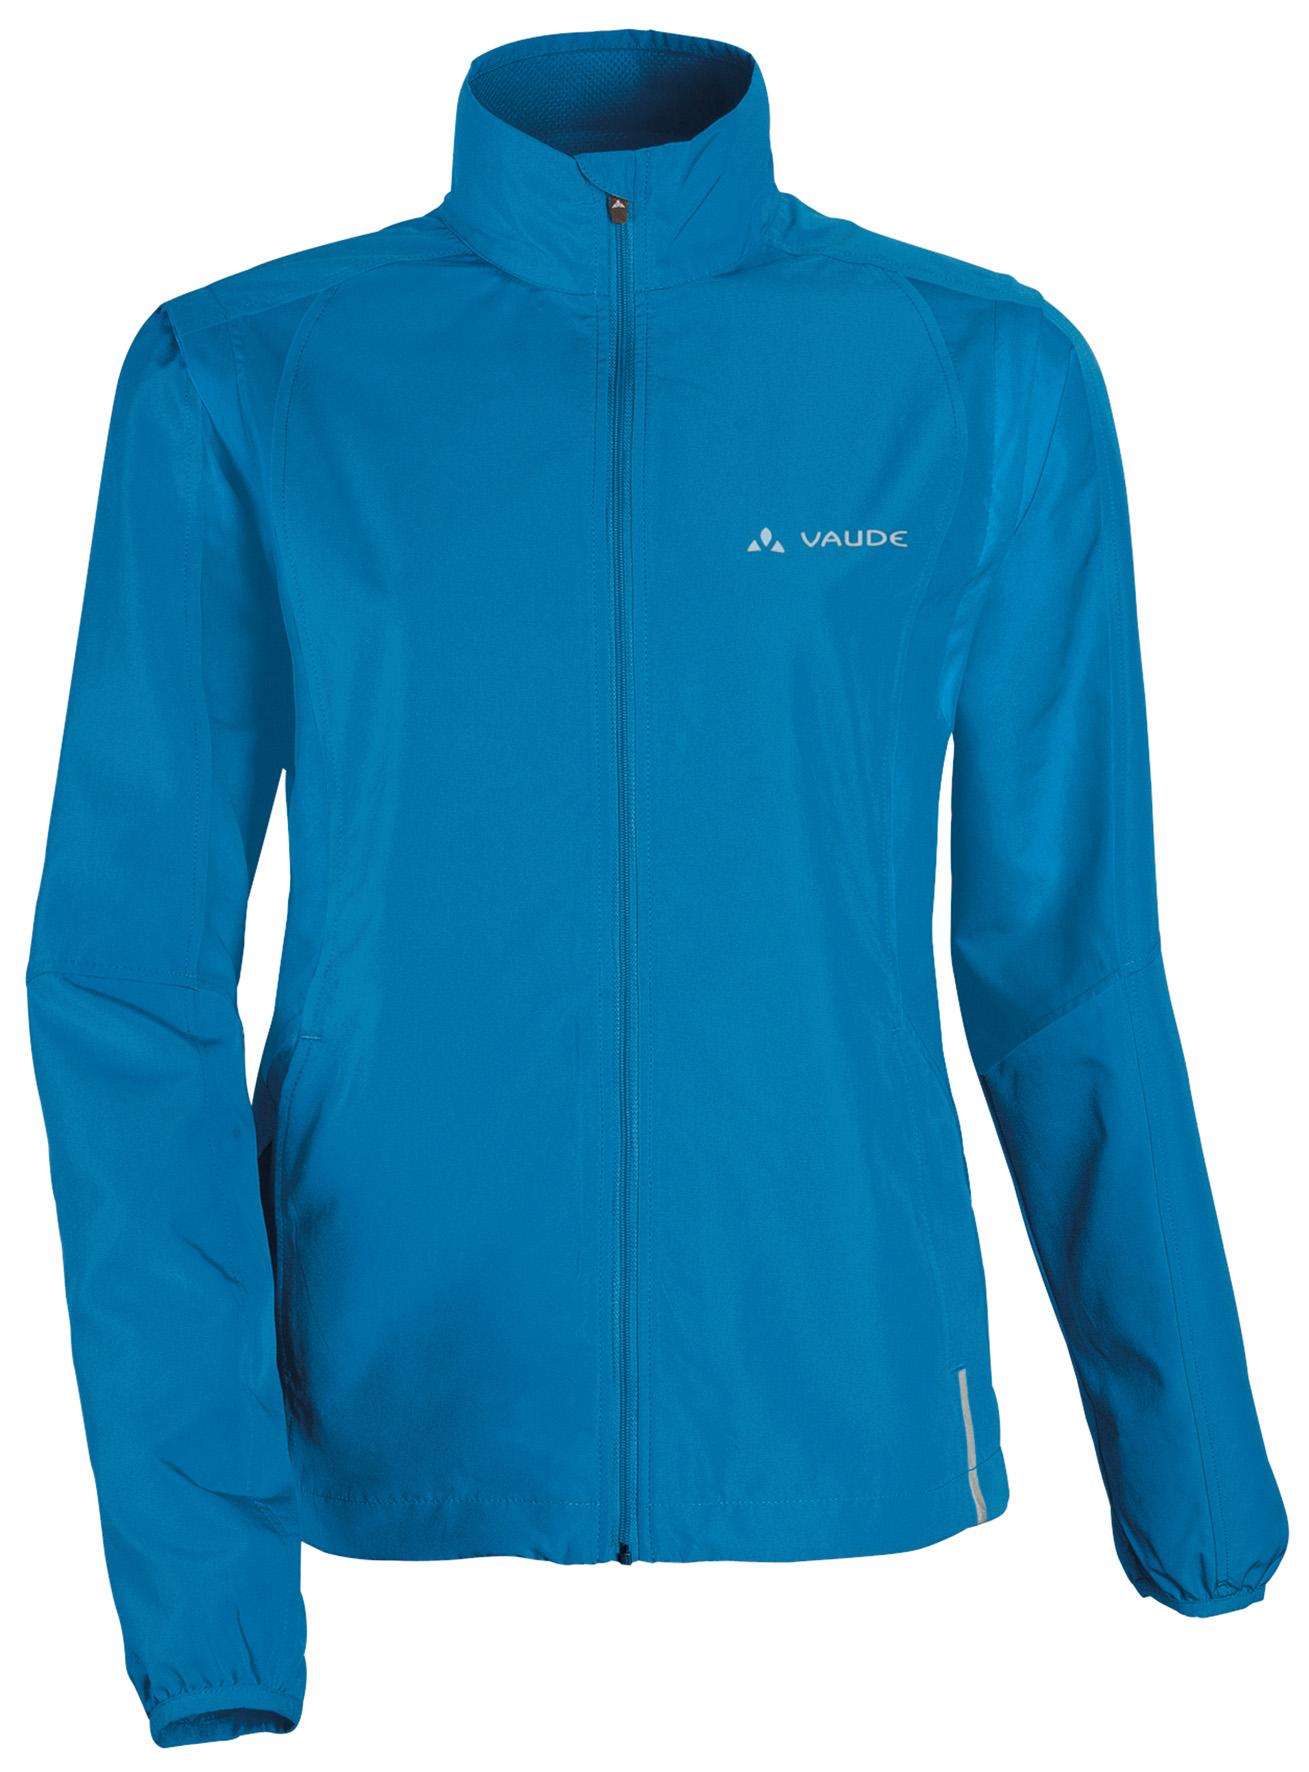 Women´s Dundee Classic ZO Jacket teal blue Größe 36 - schneider-sports